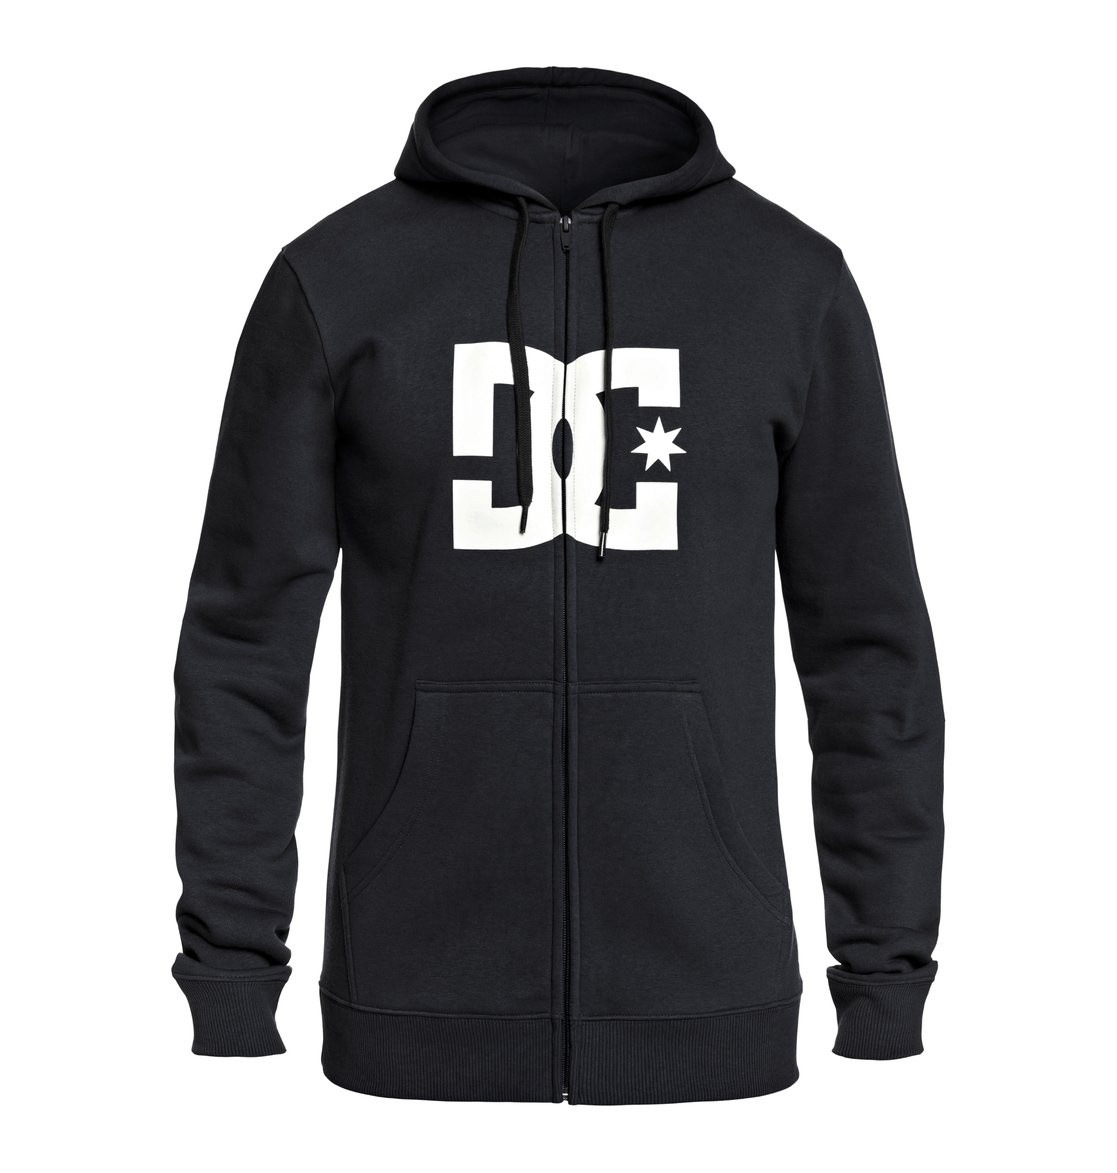 Hoodie DC  STAR ZH M OTLR  EDYSF03108